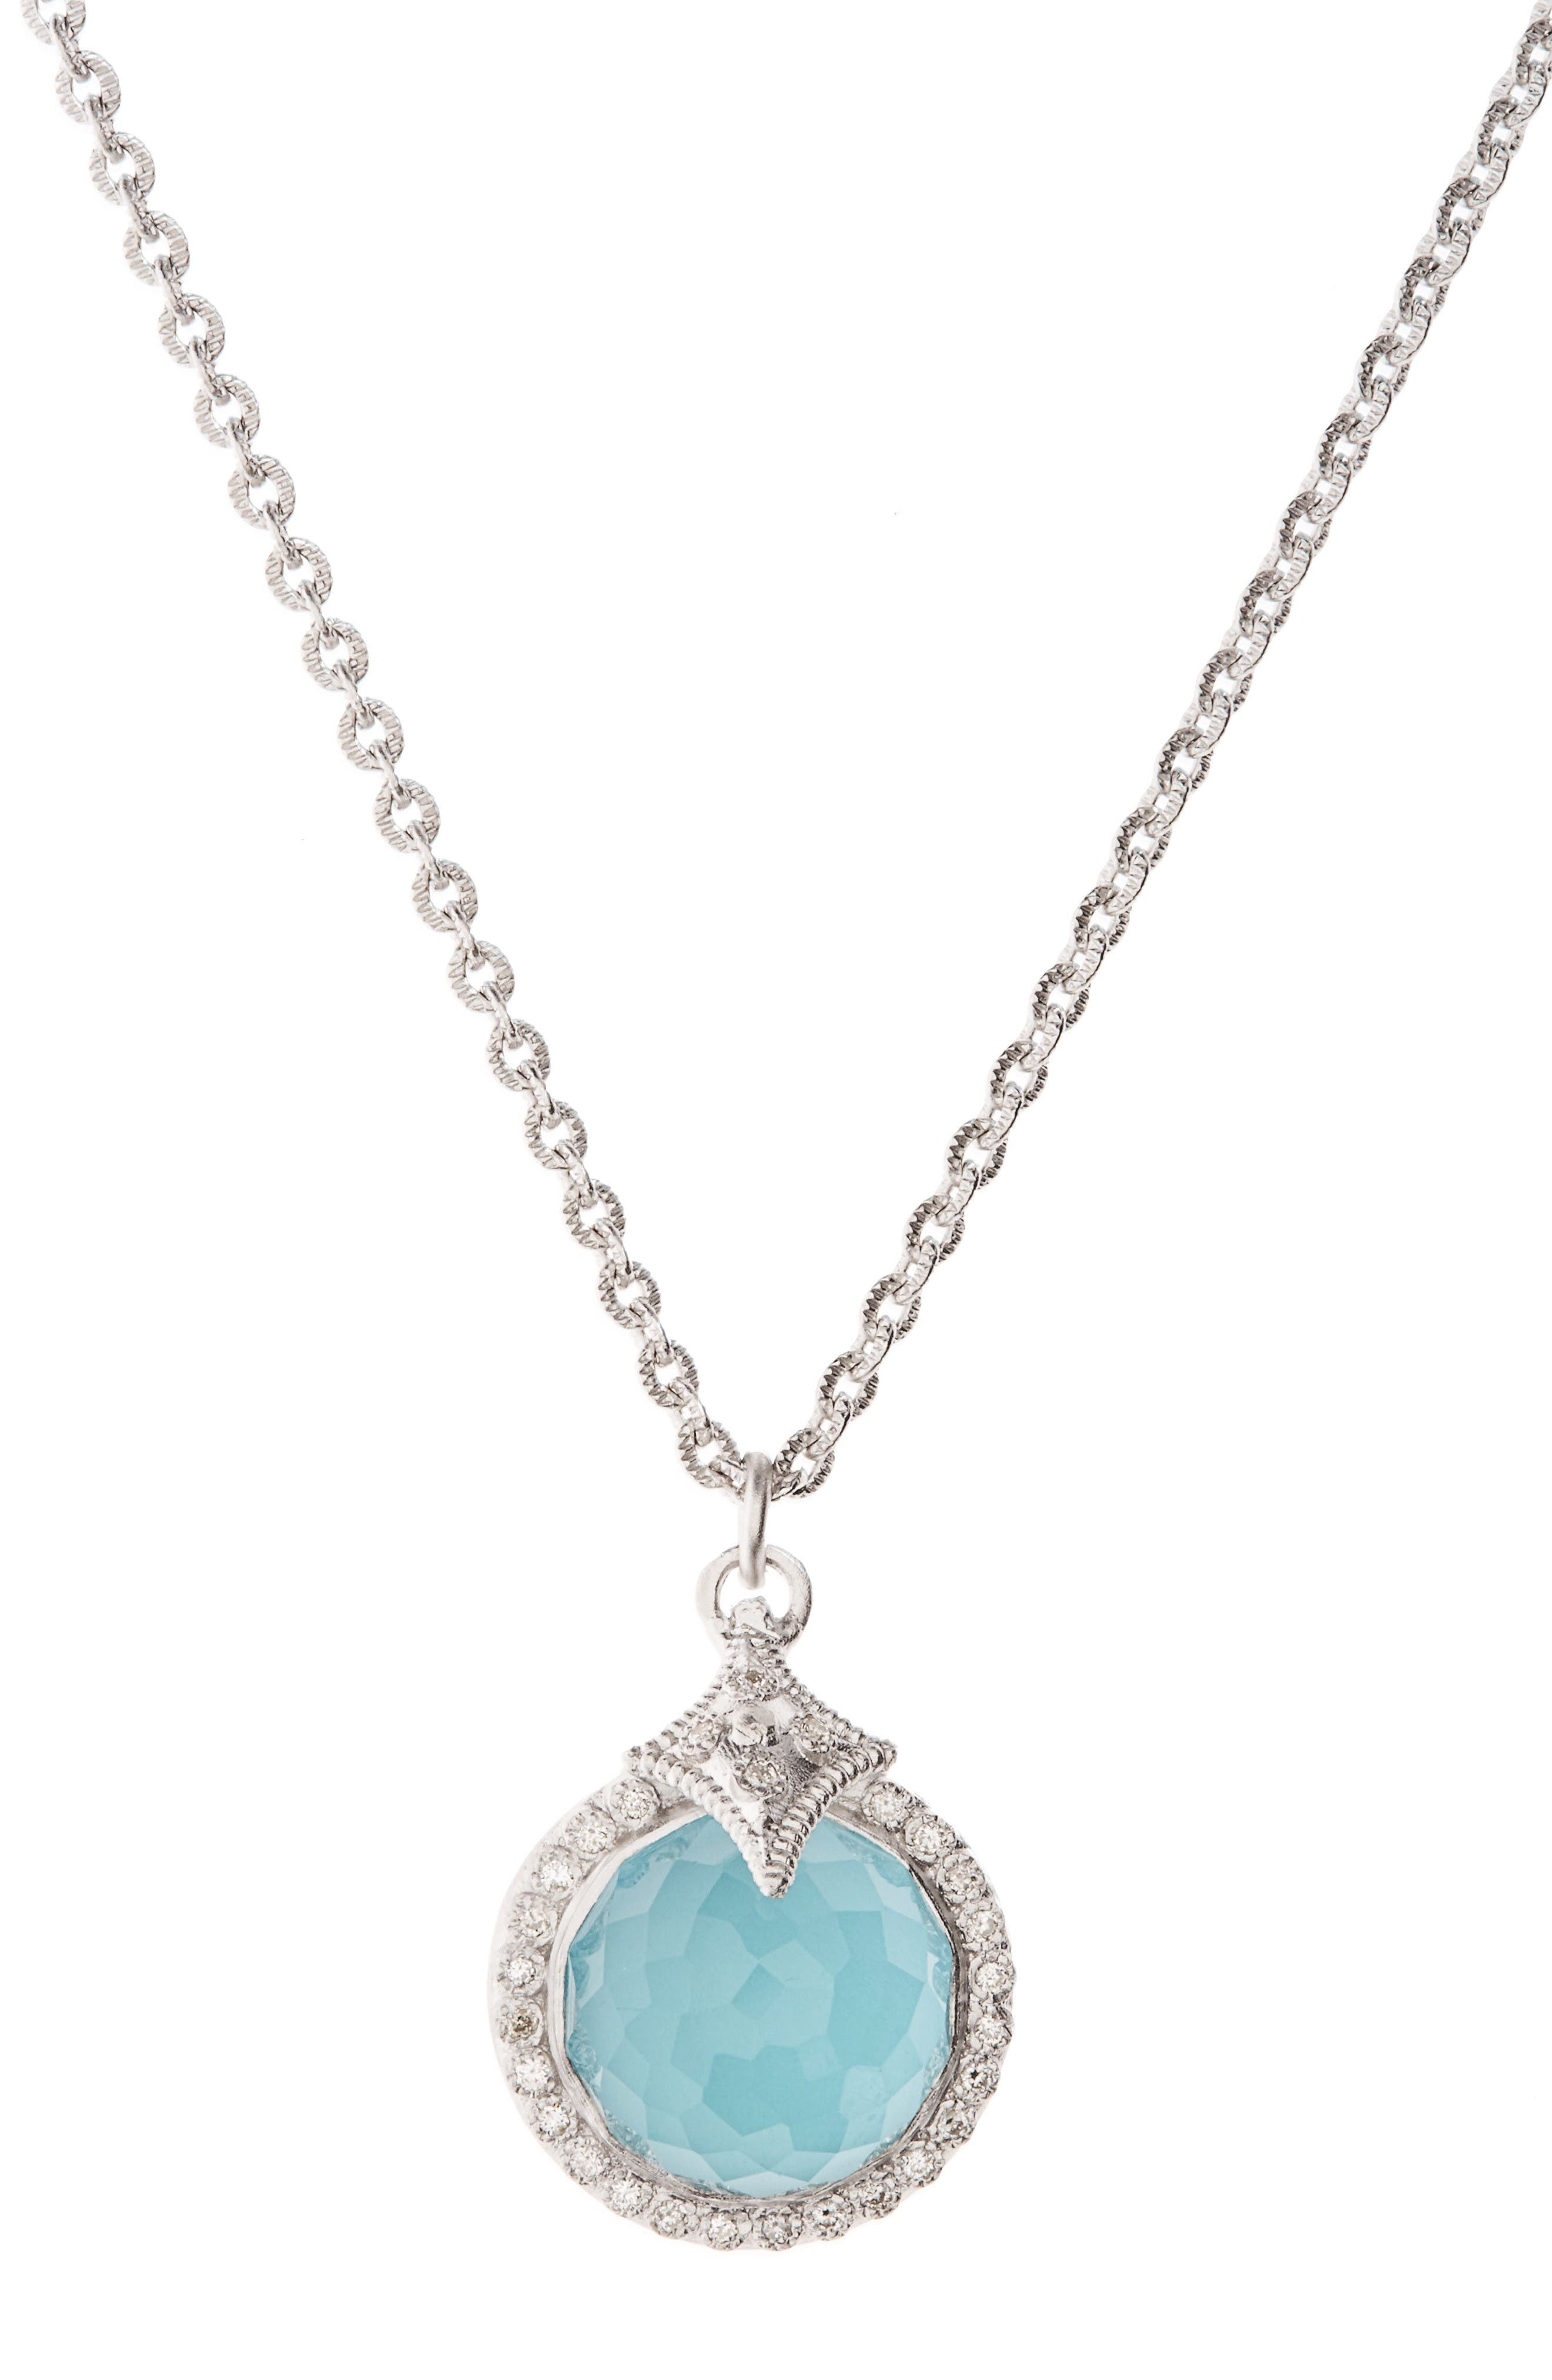 Armenta New World Turquoise Pendant Necklace